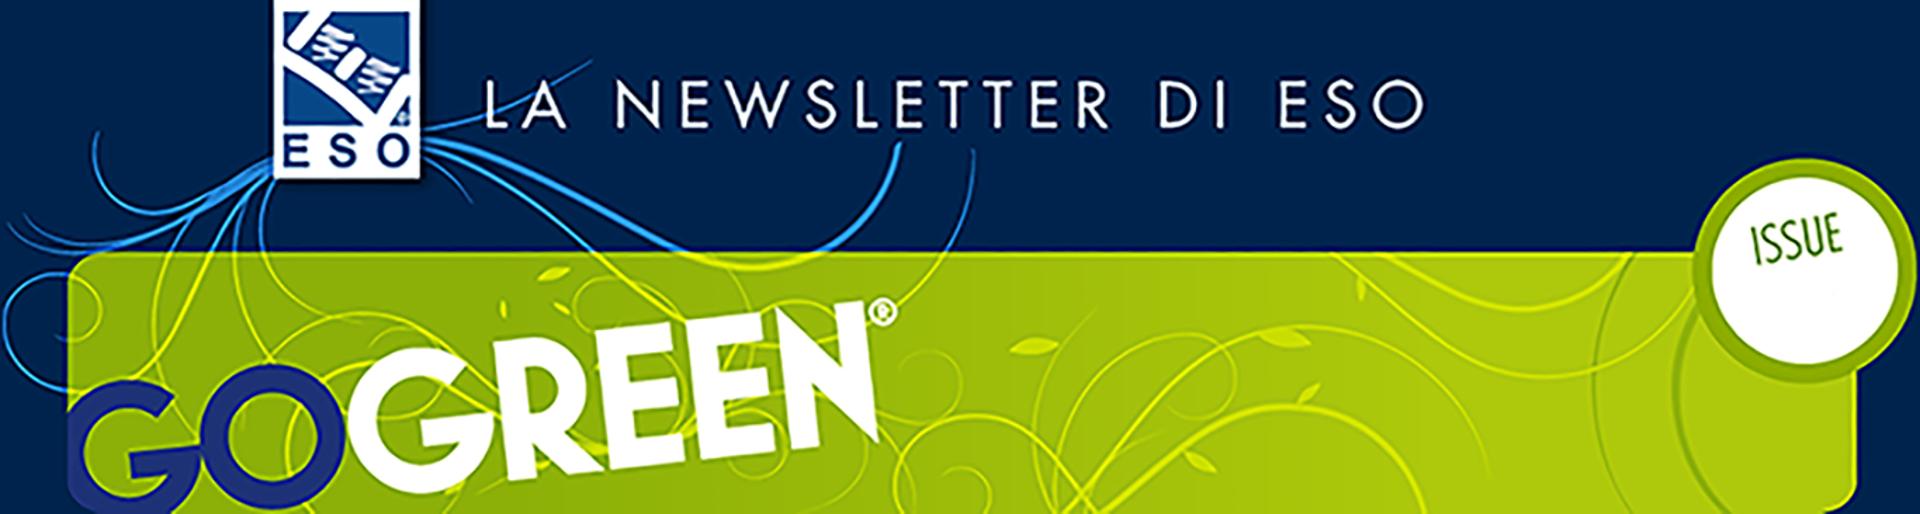 subscription newsletter